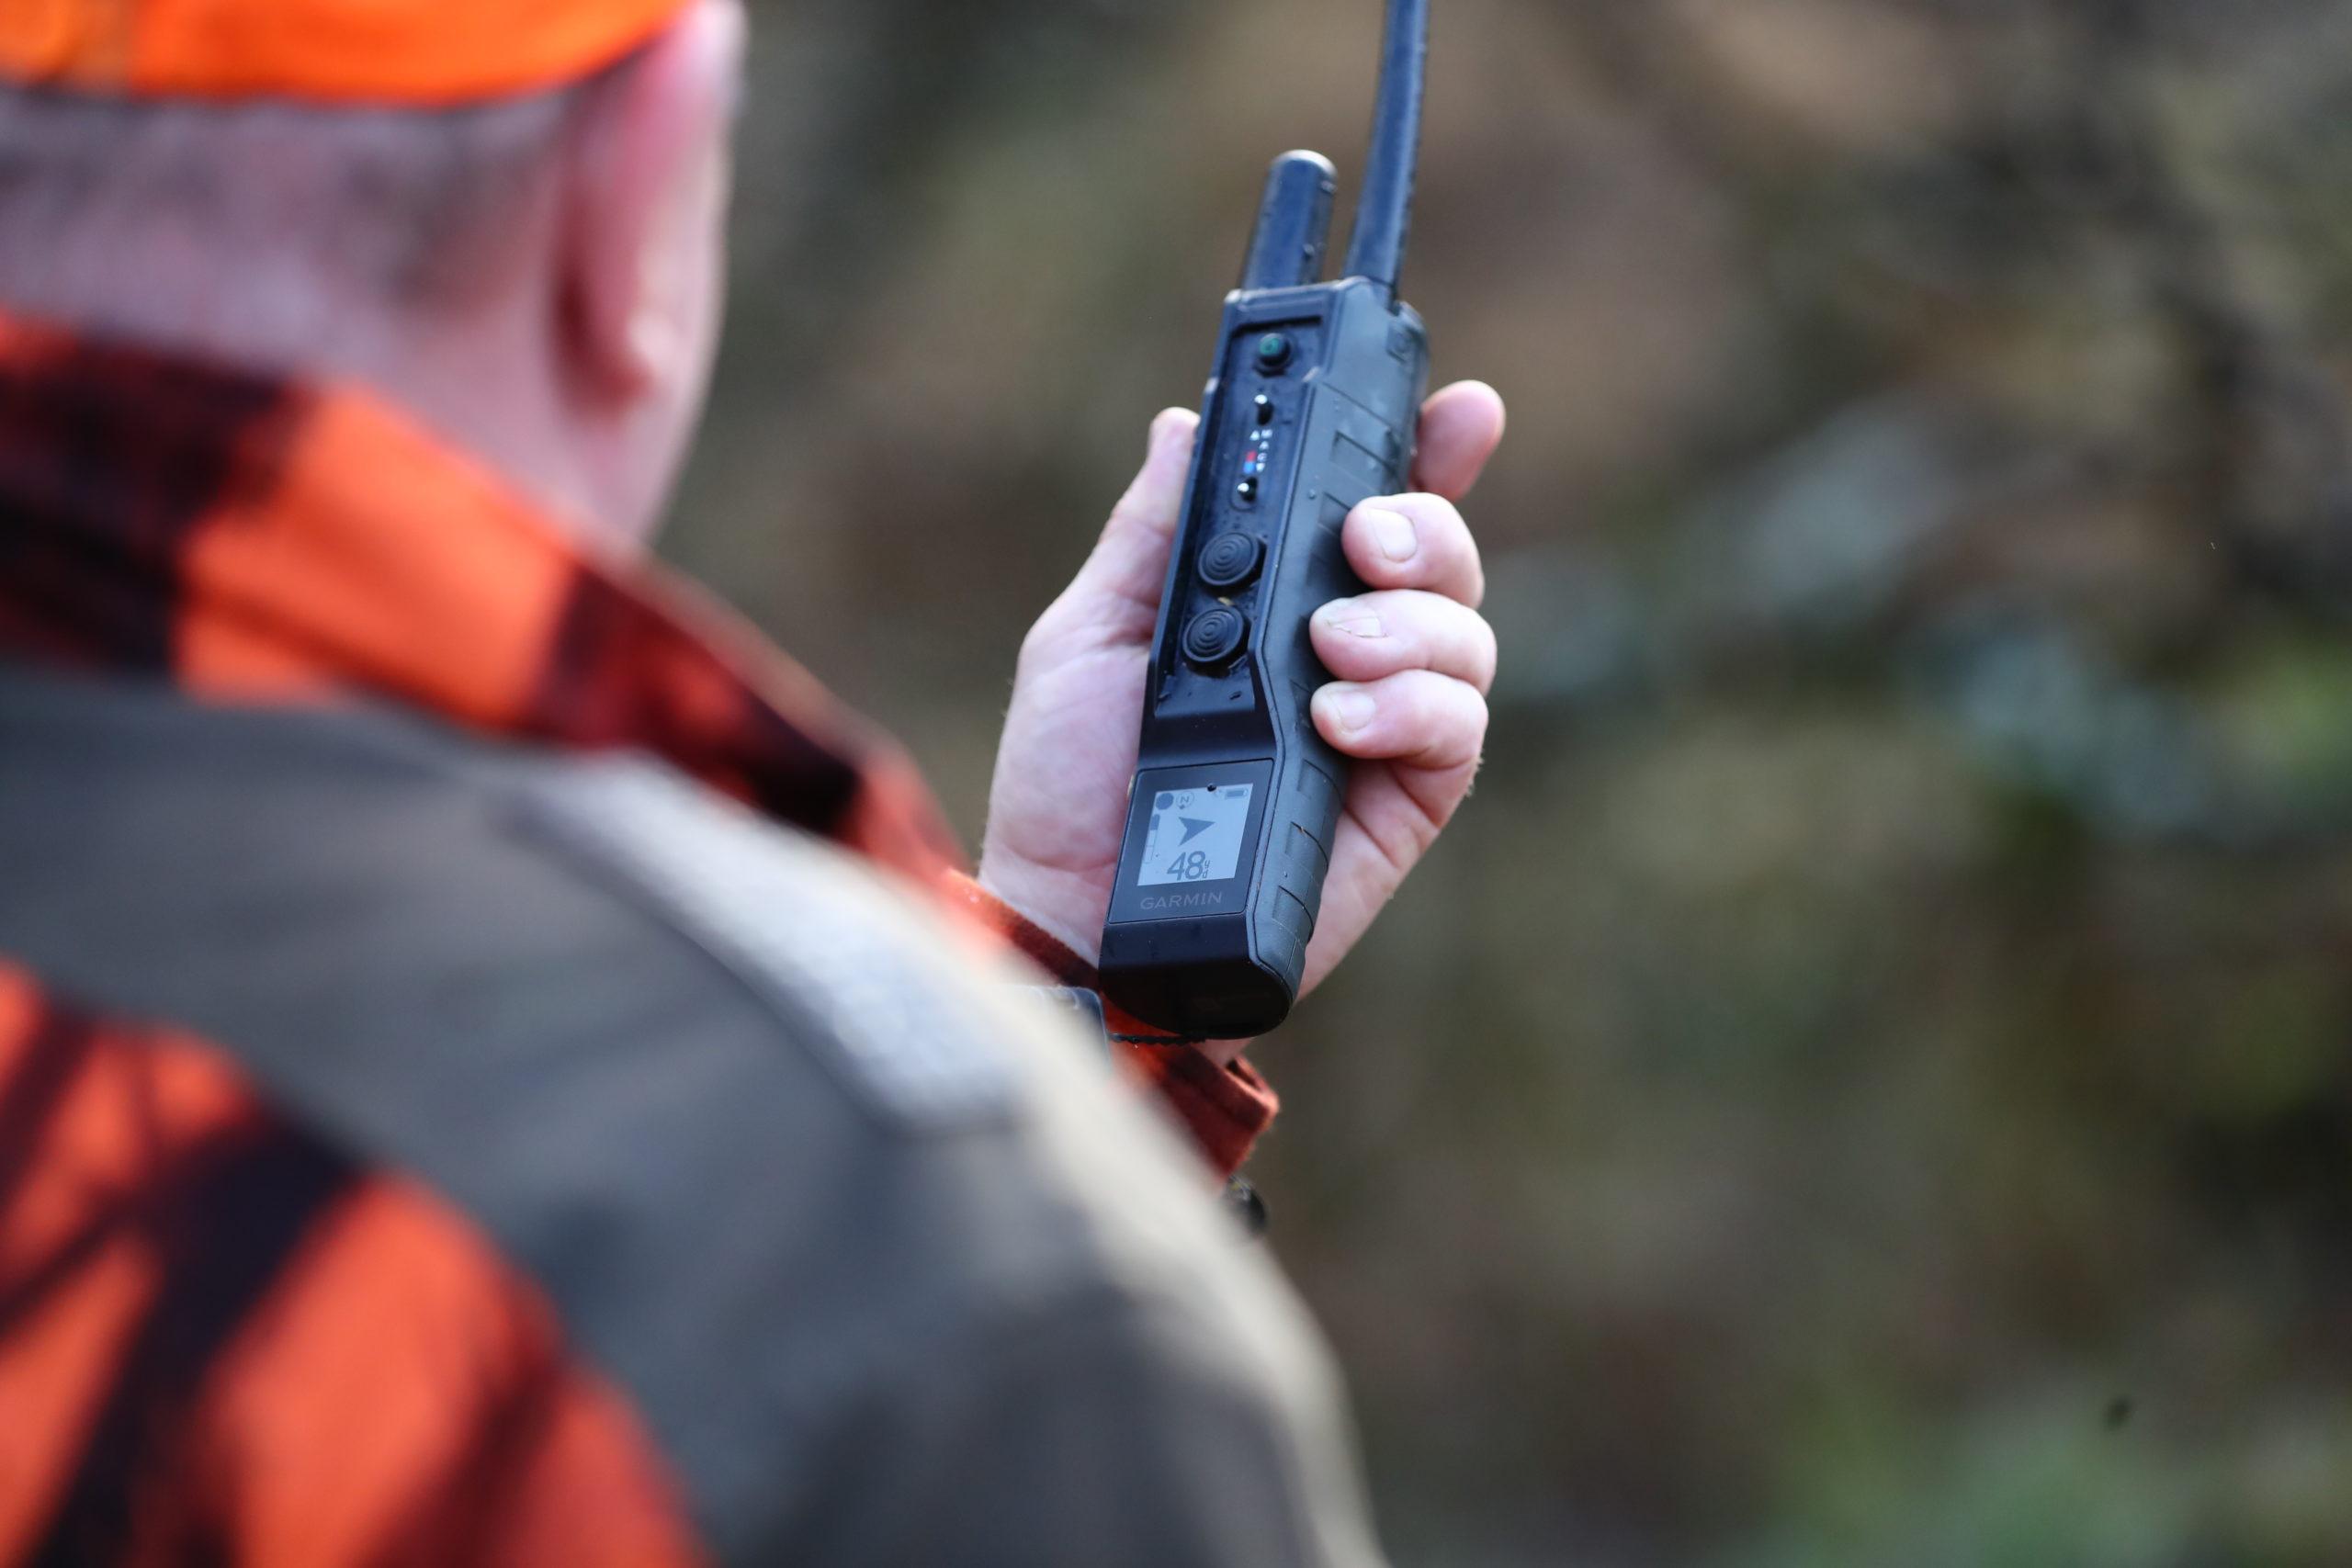 Essai du collier GPS Garmin Pro 550